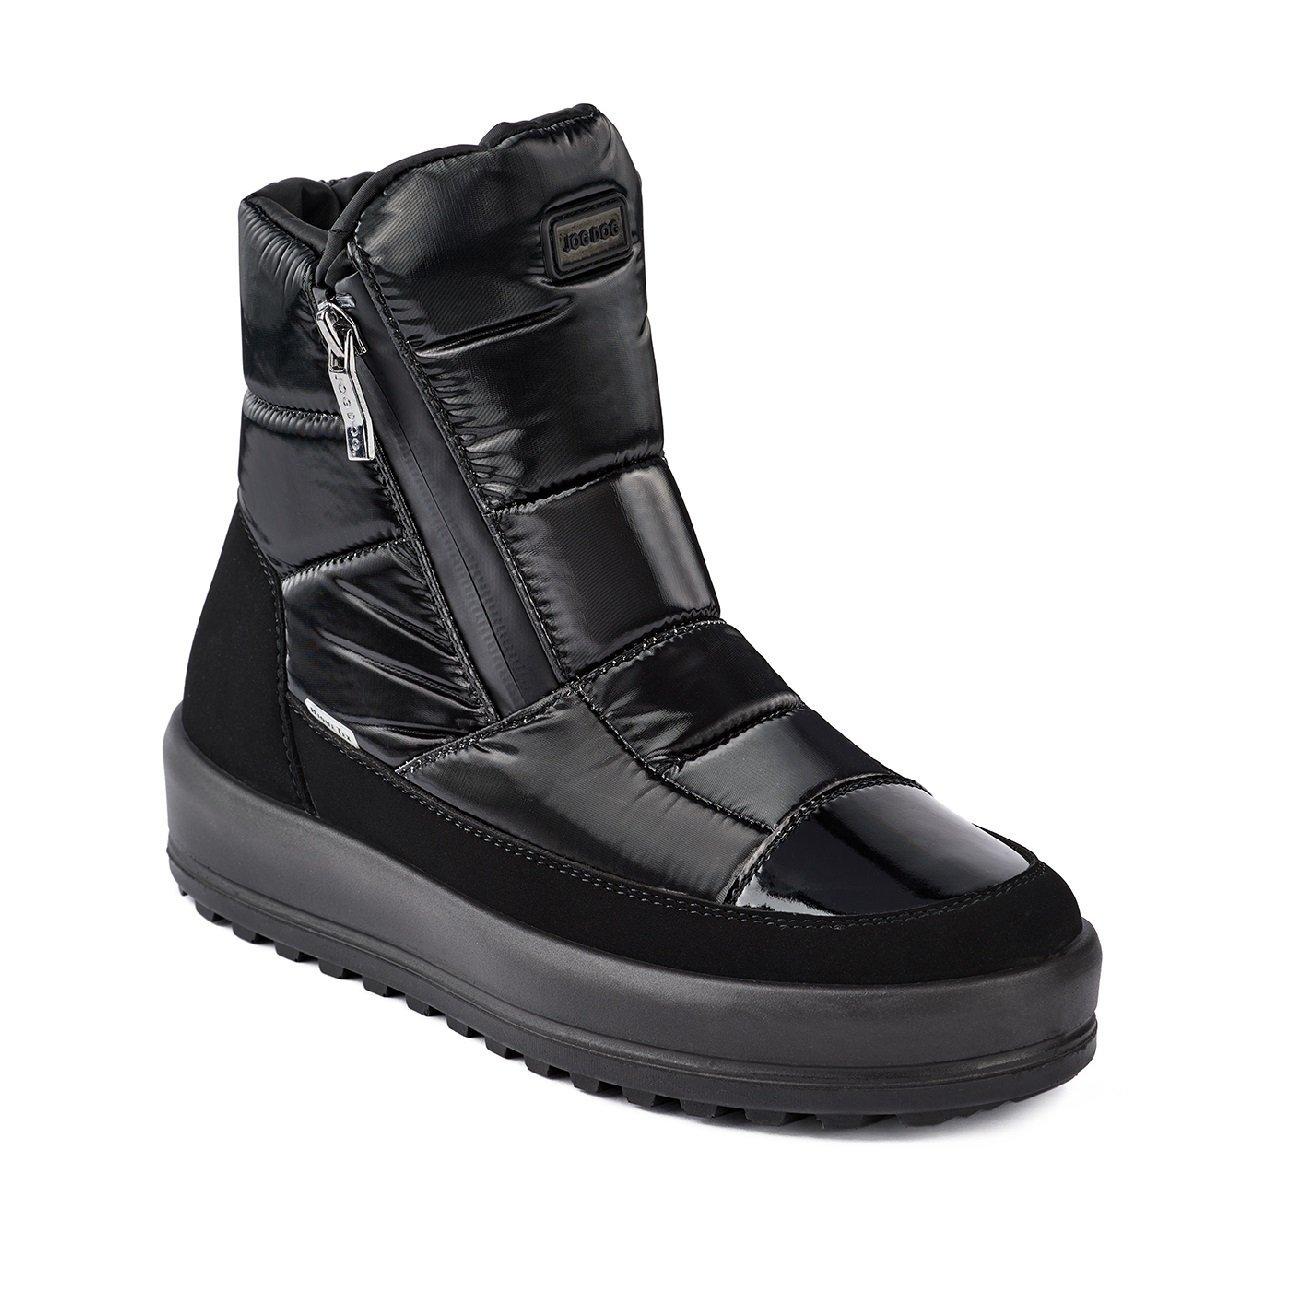 Ботинки Jog Dog Bomber Turbo (черный флэш)